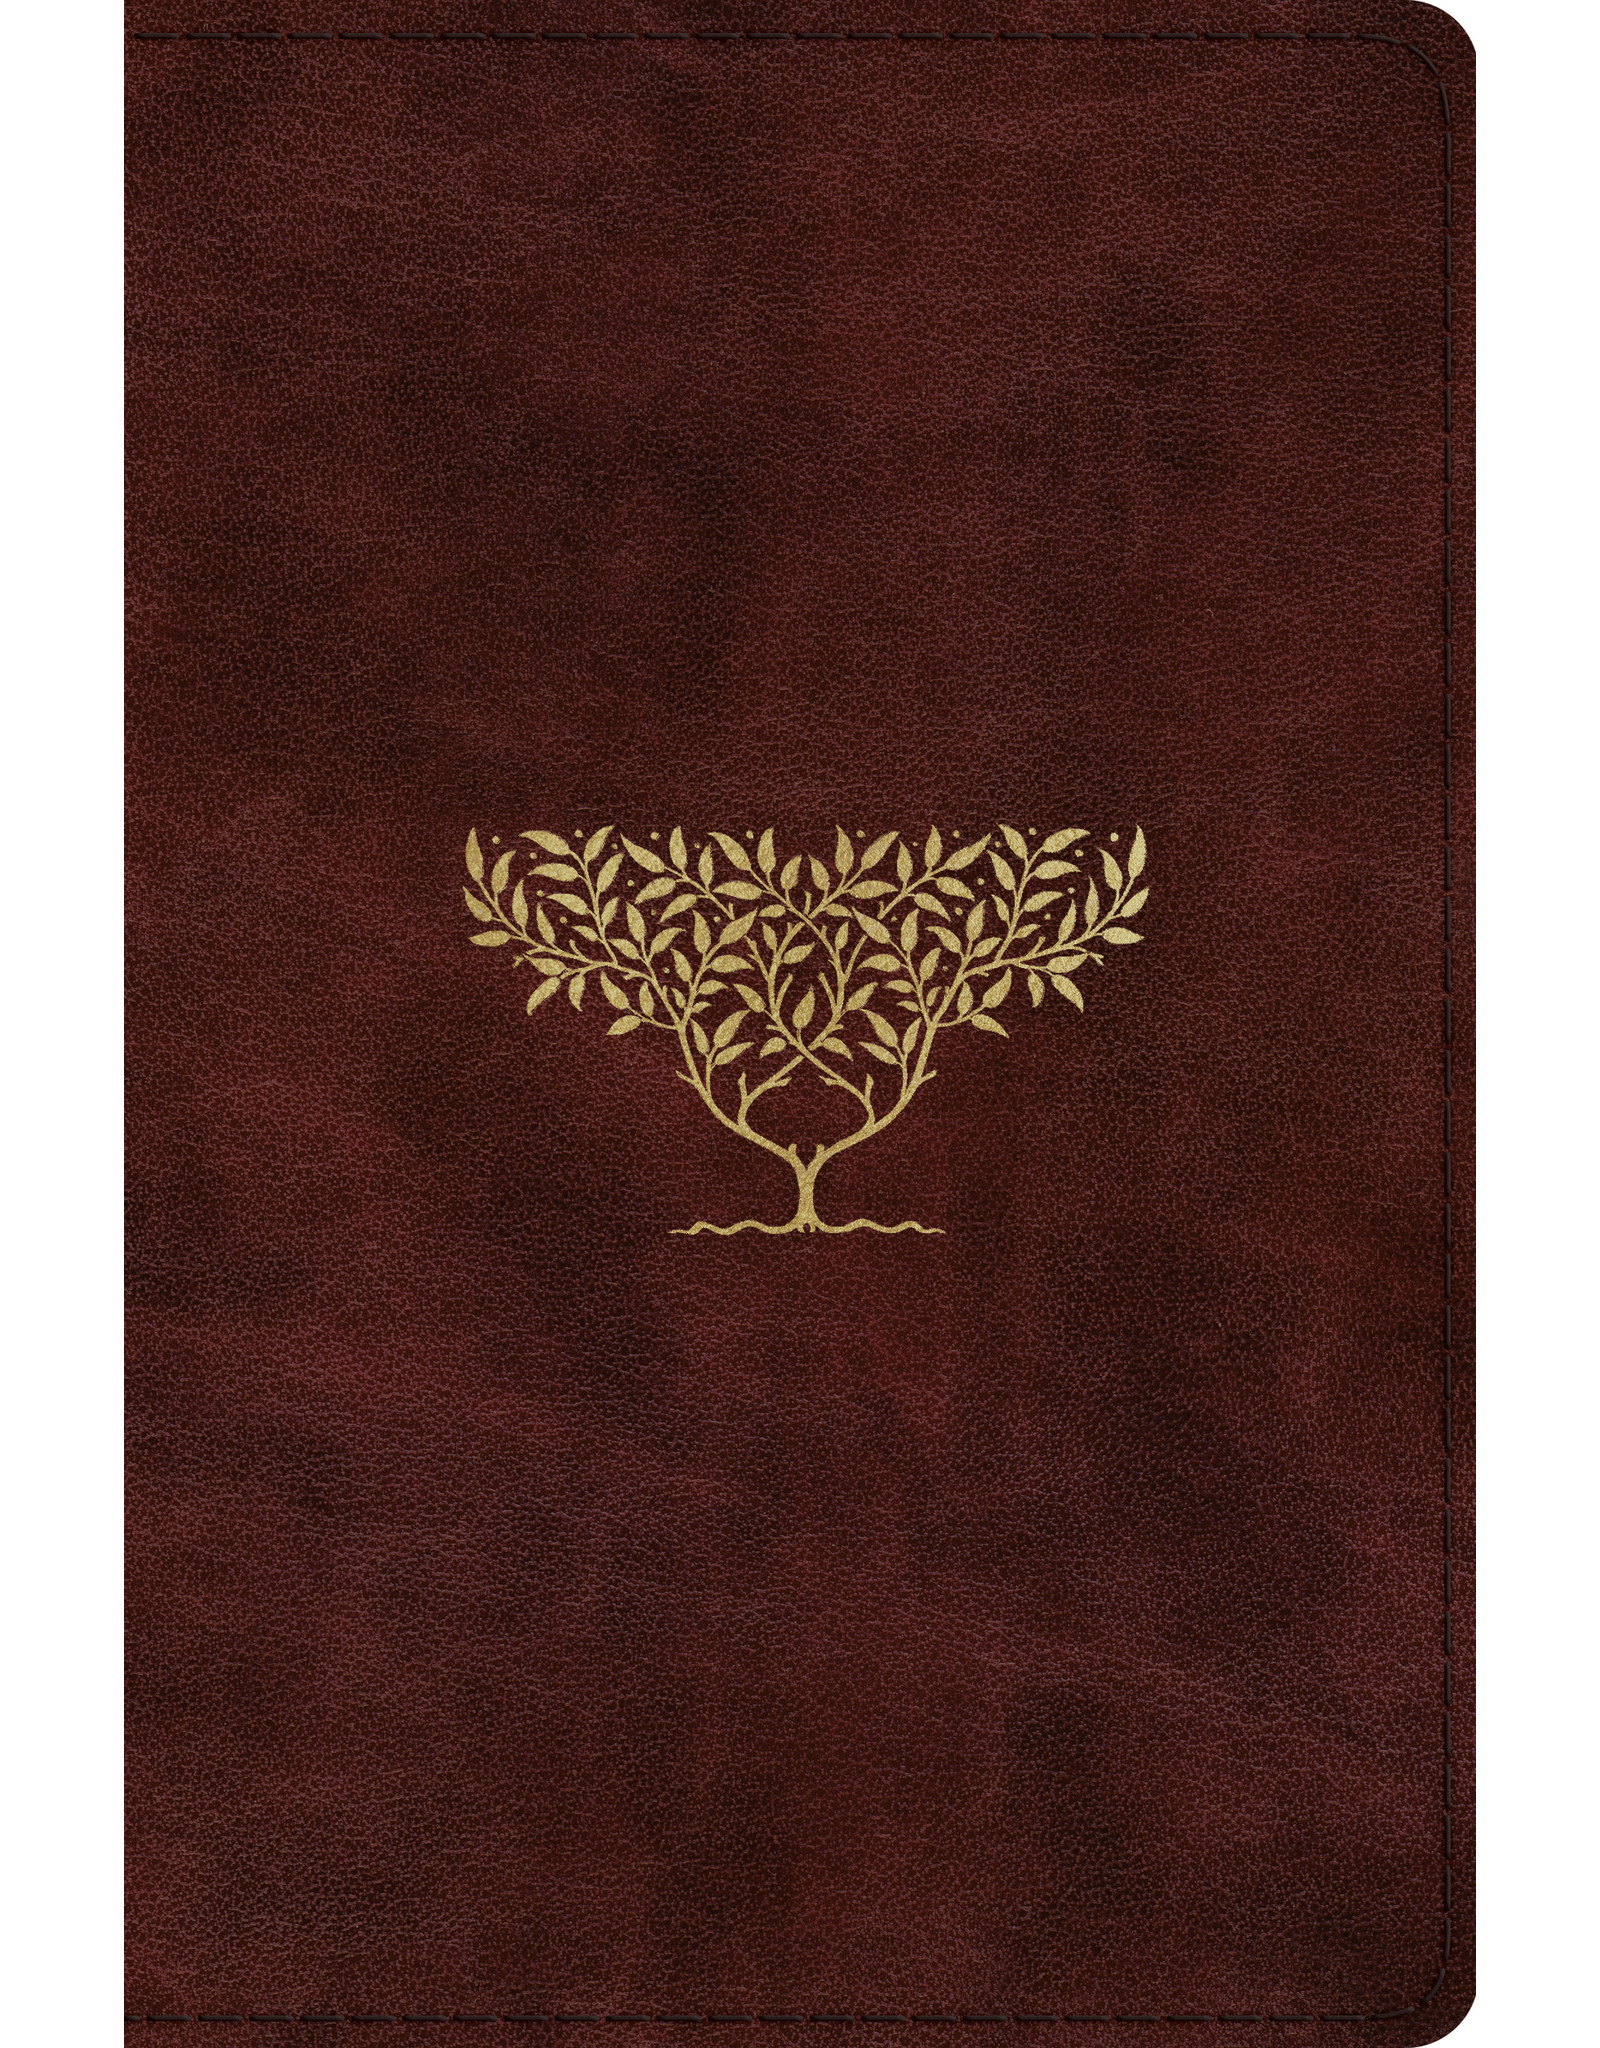 Crossway / Good News ESV Compact Bible (TruTone, Burgundy, Olive Tree Design)